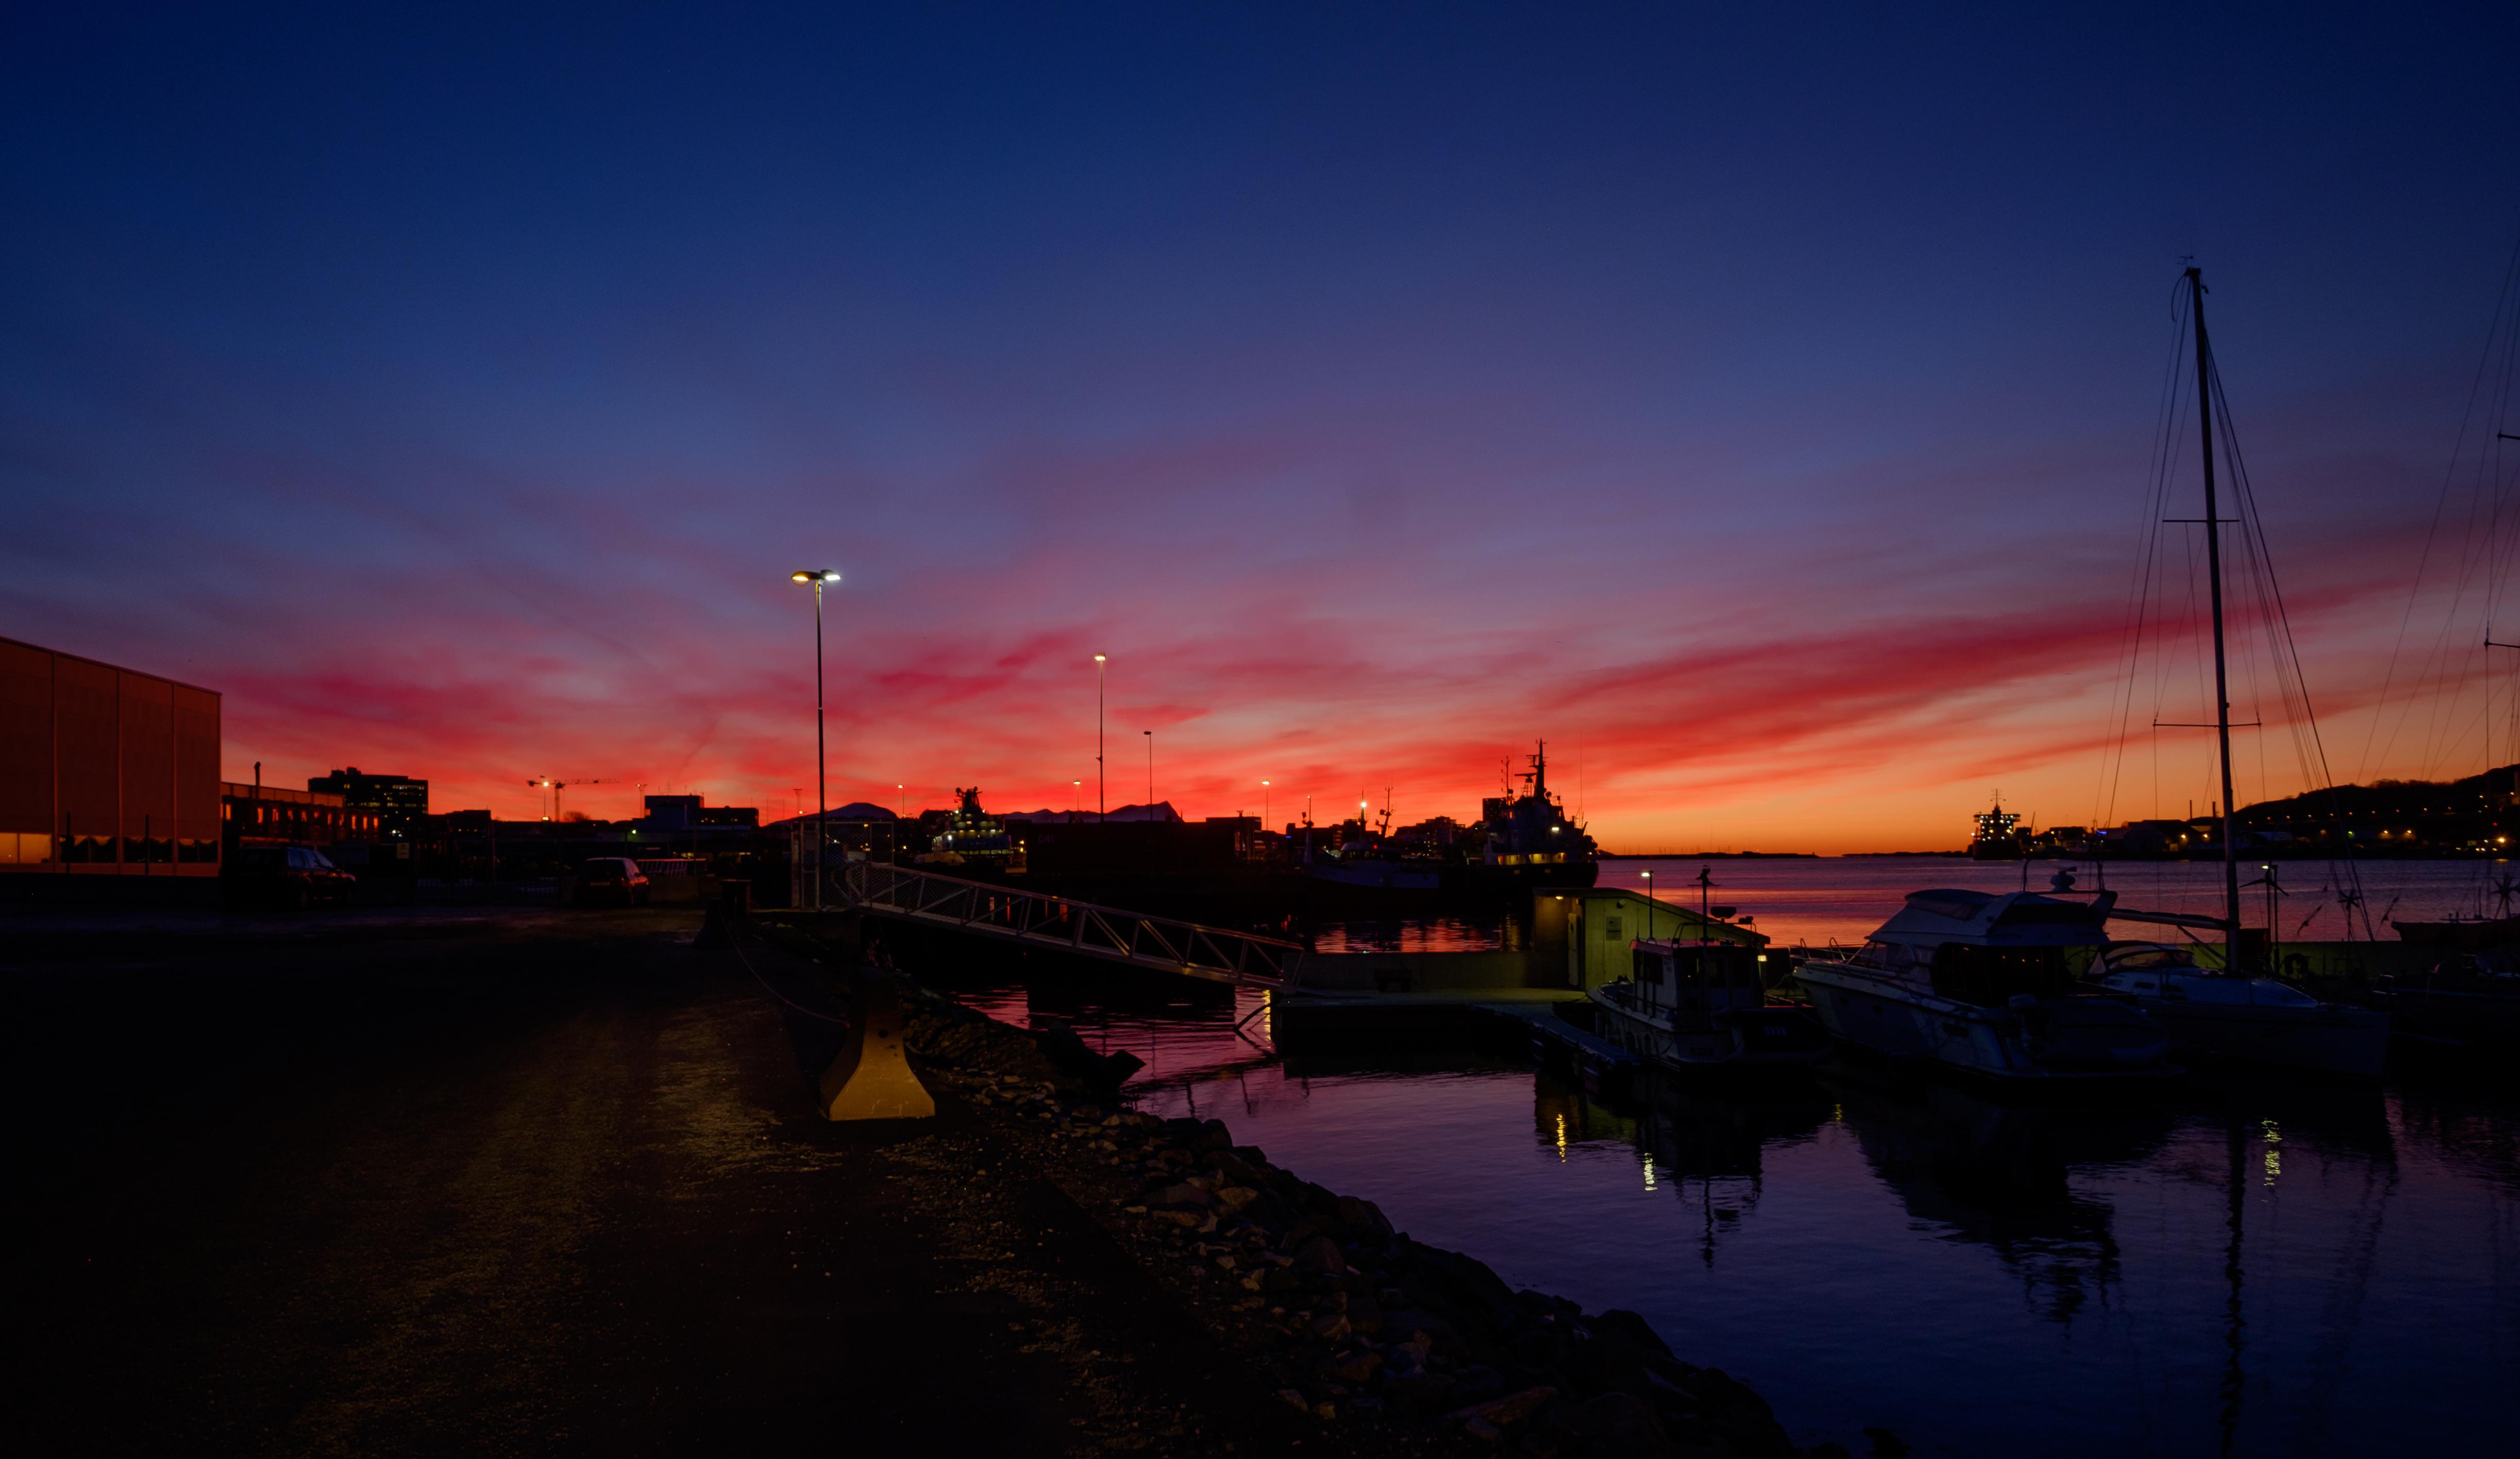 Sunset, Bodø Havn Jan 15, Architecture, Bridge, Dusk, Fujifilm, HQ Photo